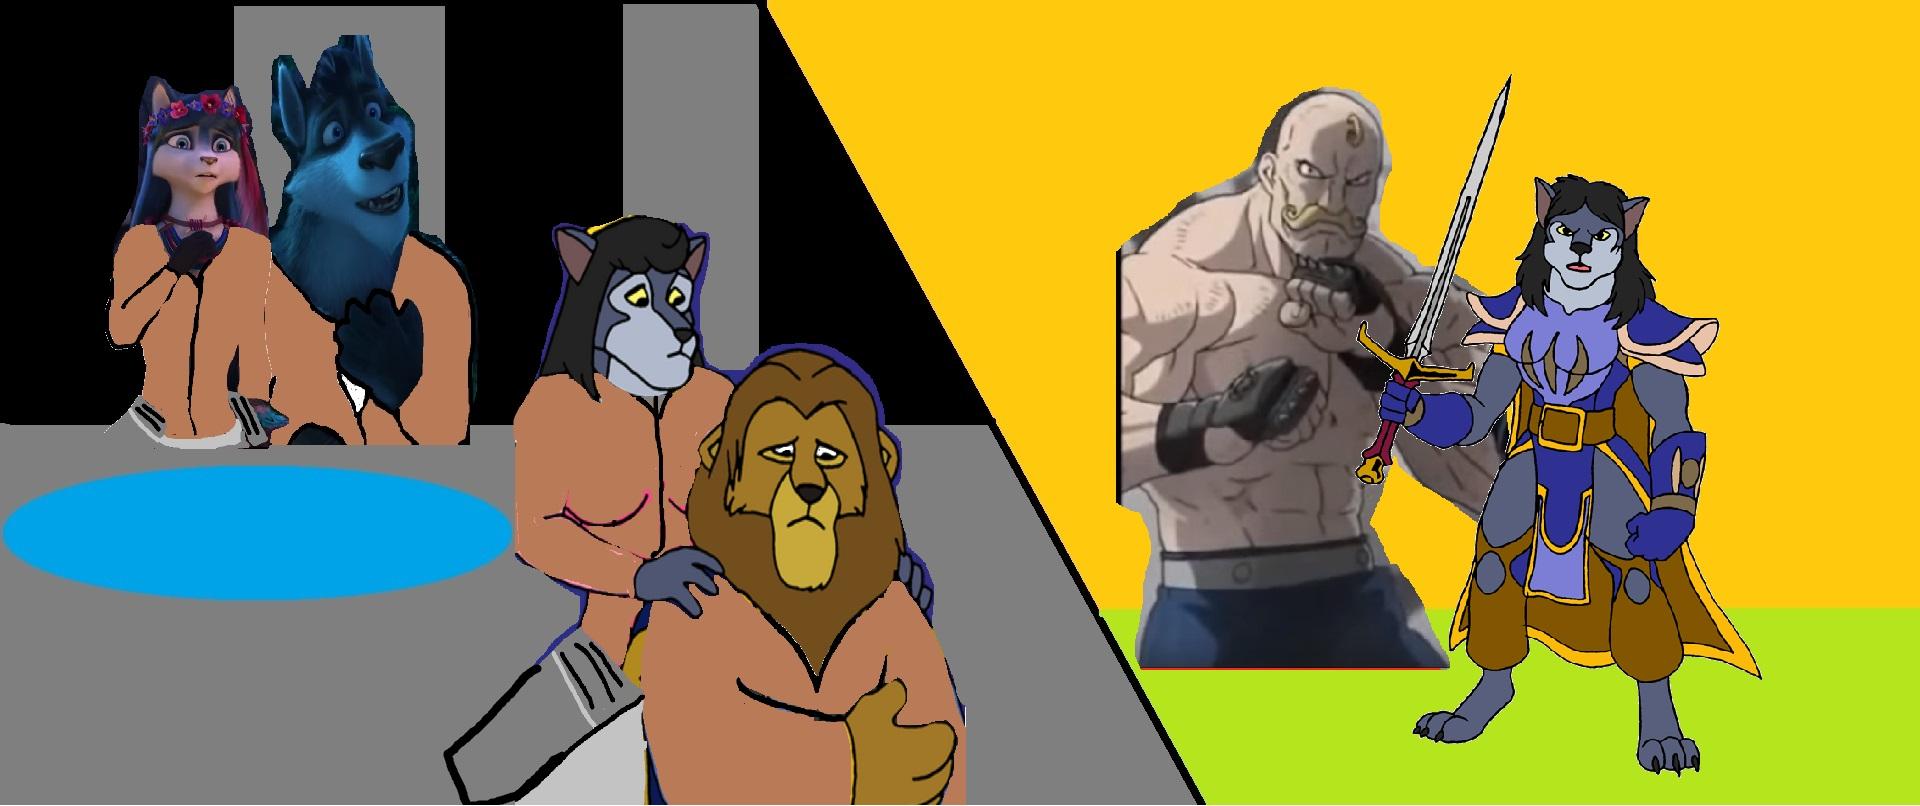 Attack on Titan LKHFF Style by KingLeoLionheart on DeviantArt